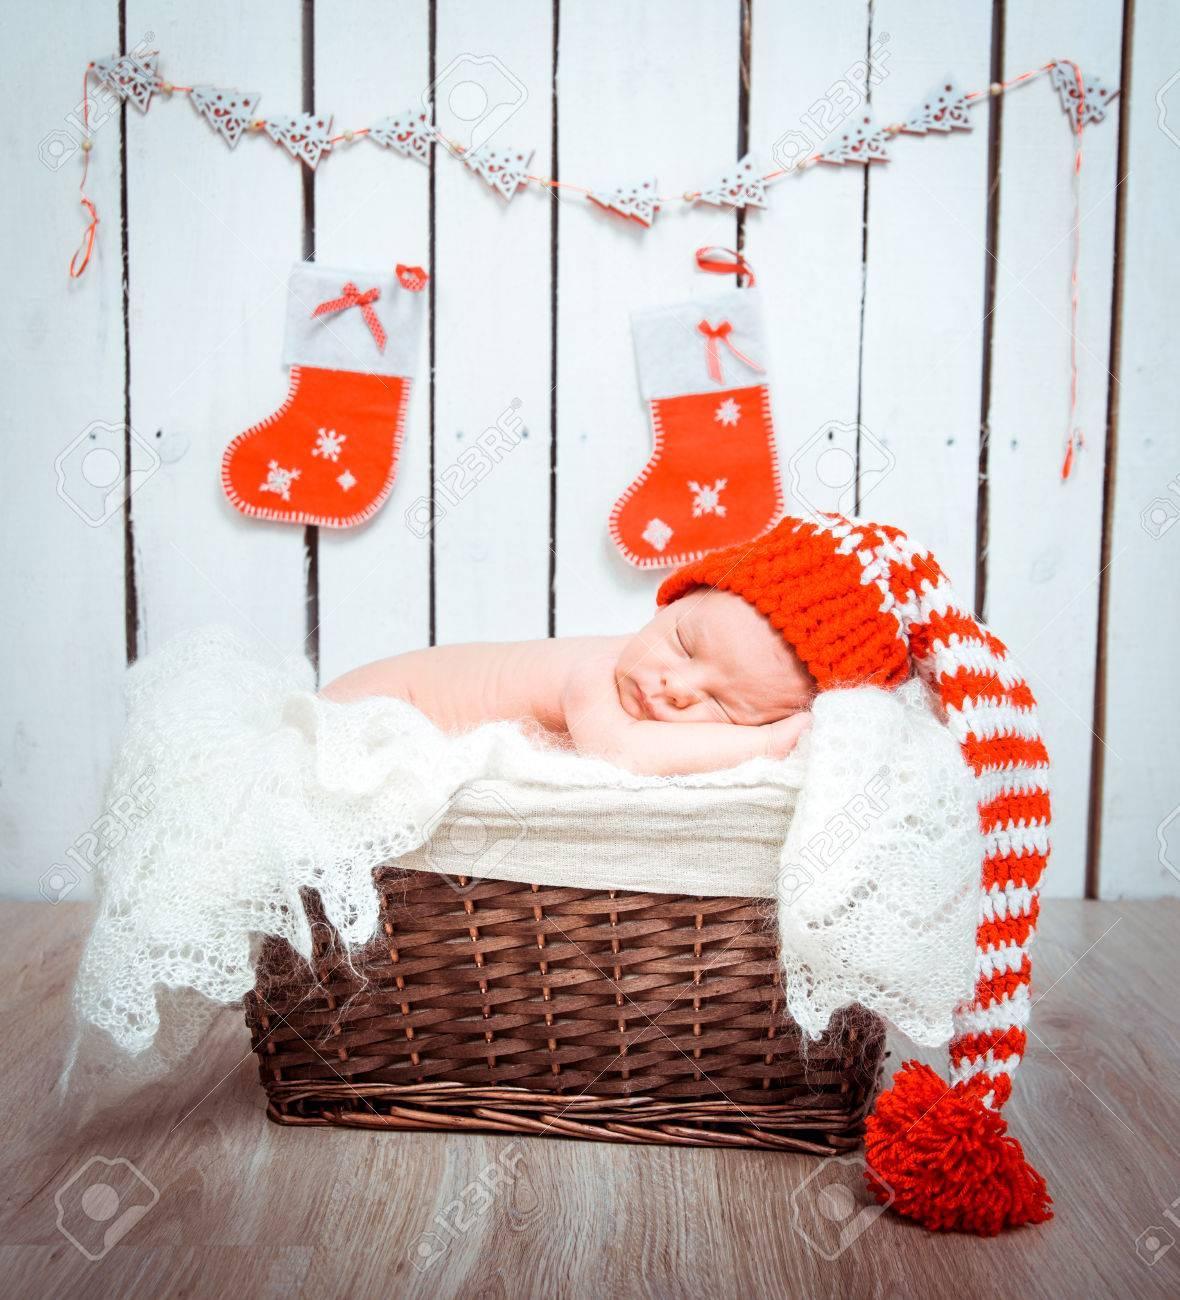 Cute newborn baby sleeps in a santa claus hat close-up - 32252212